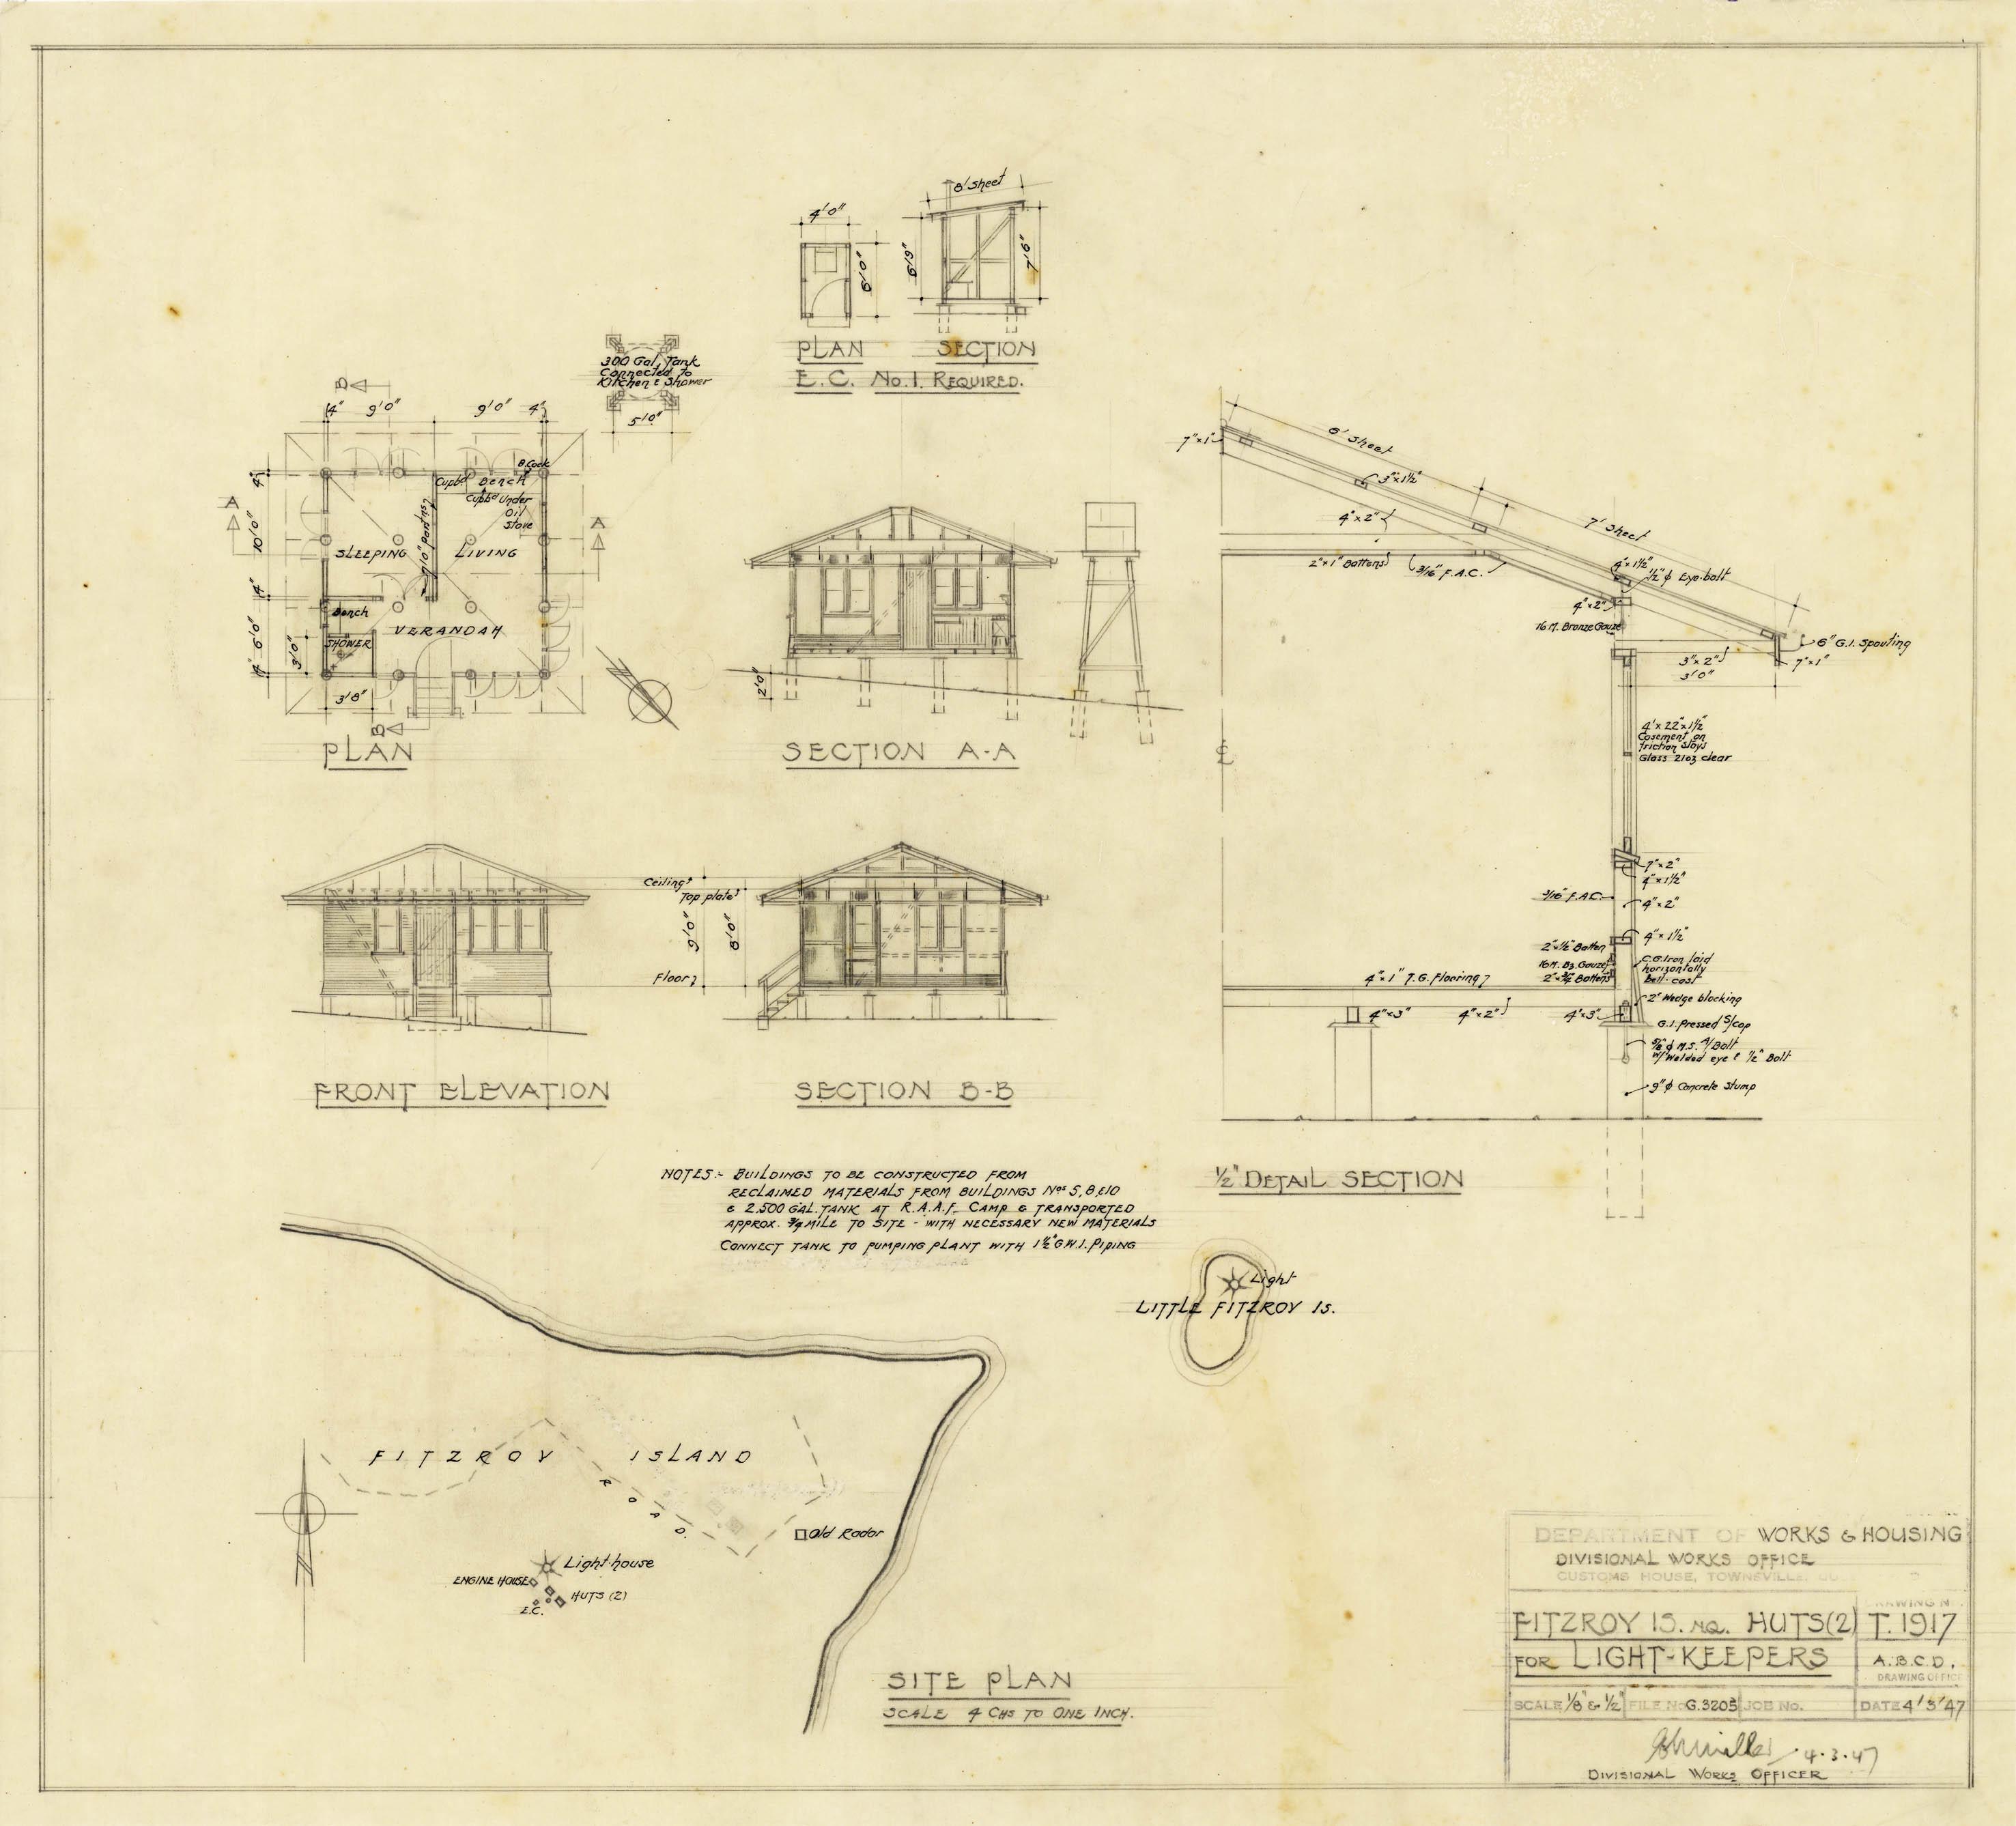 Fitzroy island light for Lighthouse blueprints plans